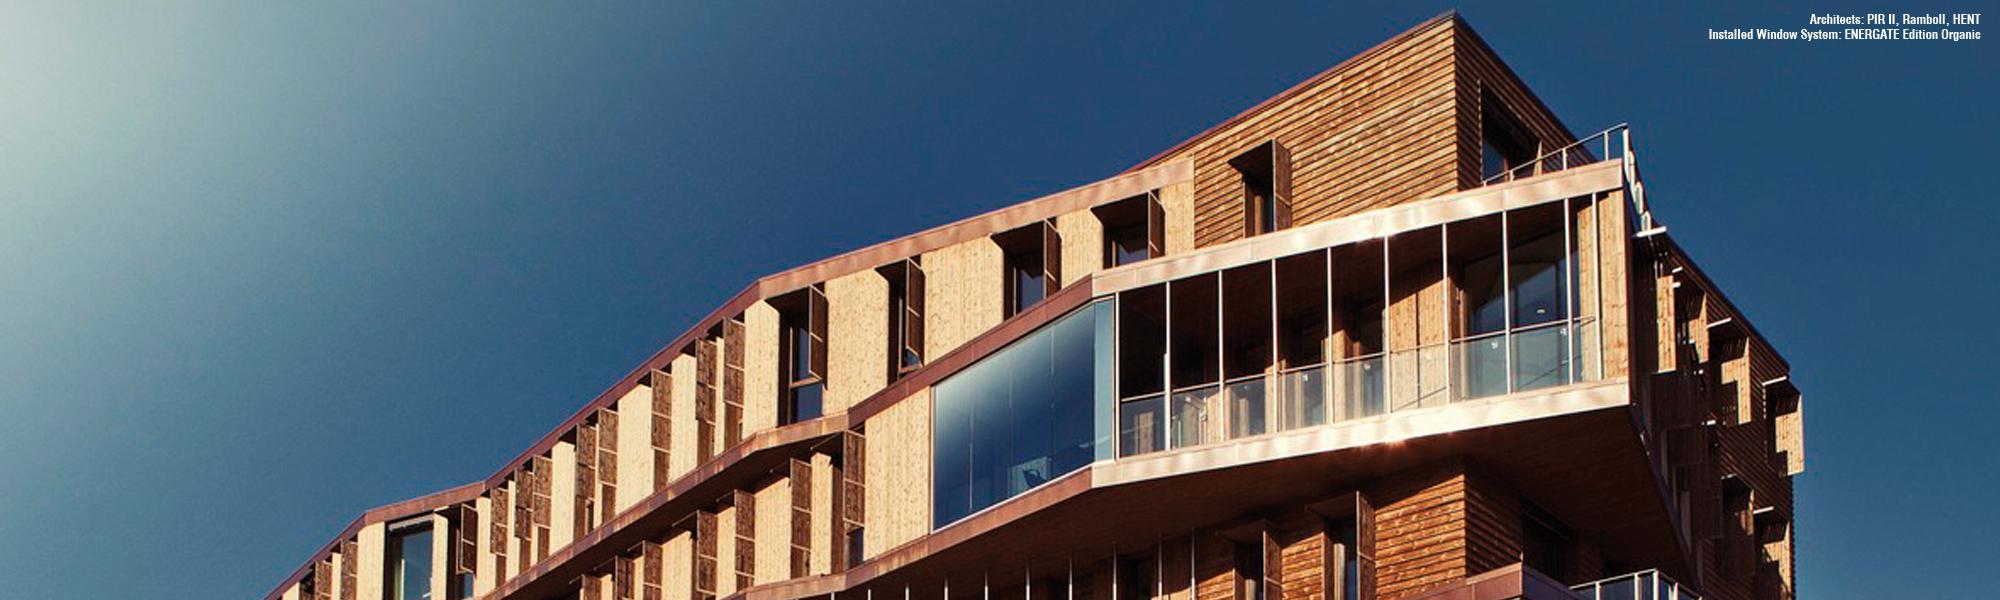 Energy-efficient custom-made windows and doors at highest european level.